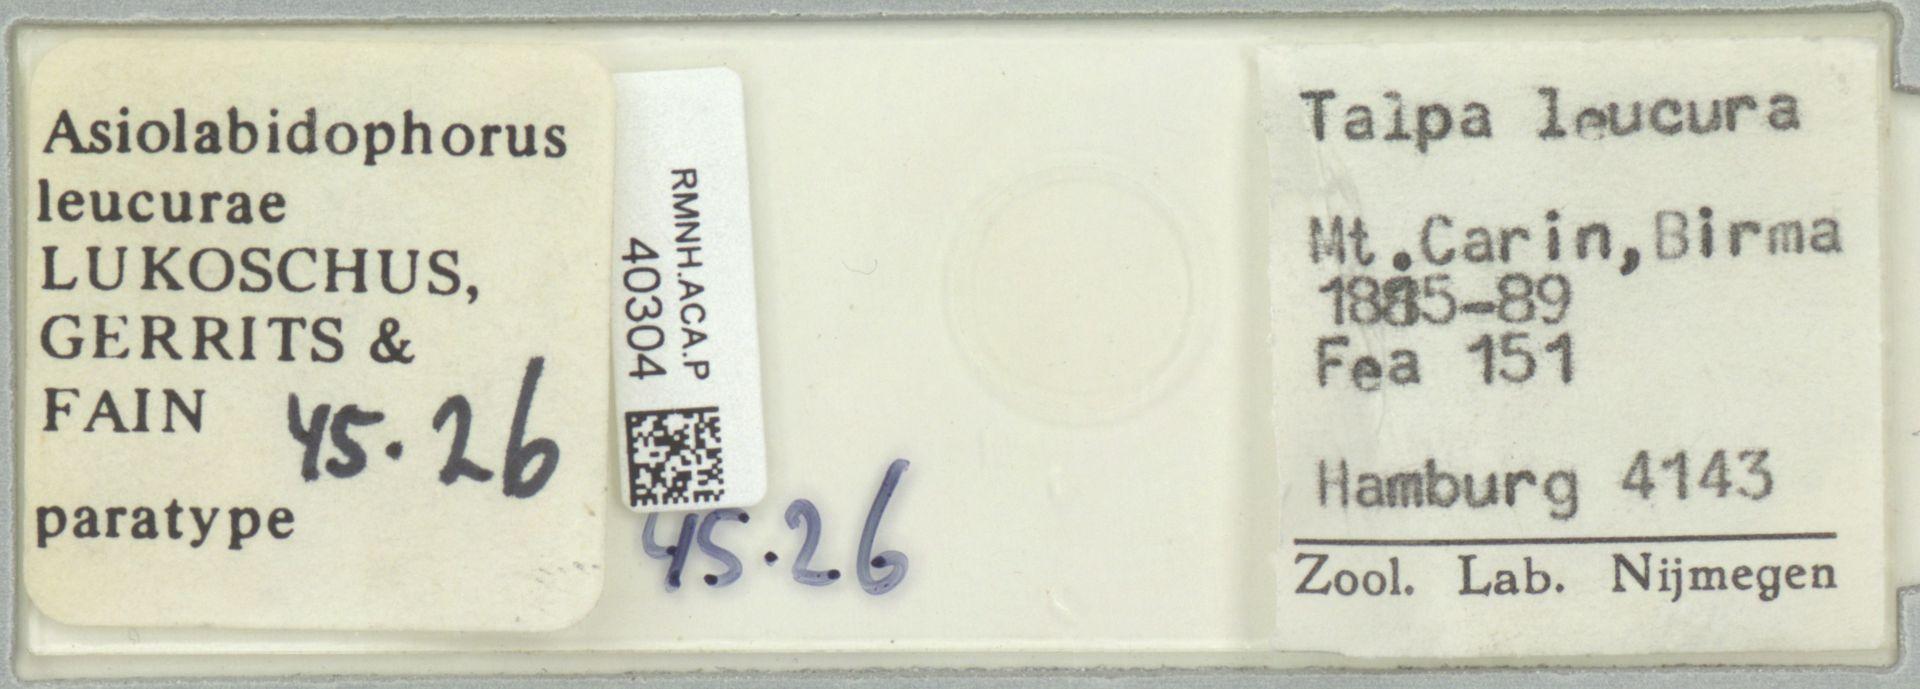 RMNH.ACA.P.40304   Asiolabidophorus leucurae Lukoschus, Gerrits & Fain